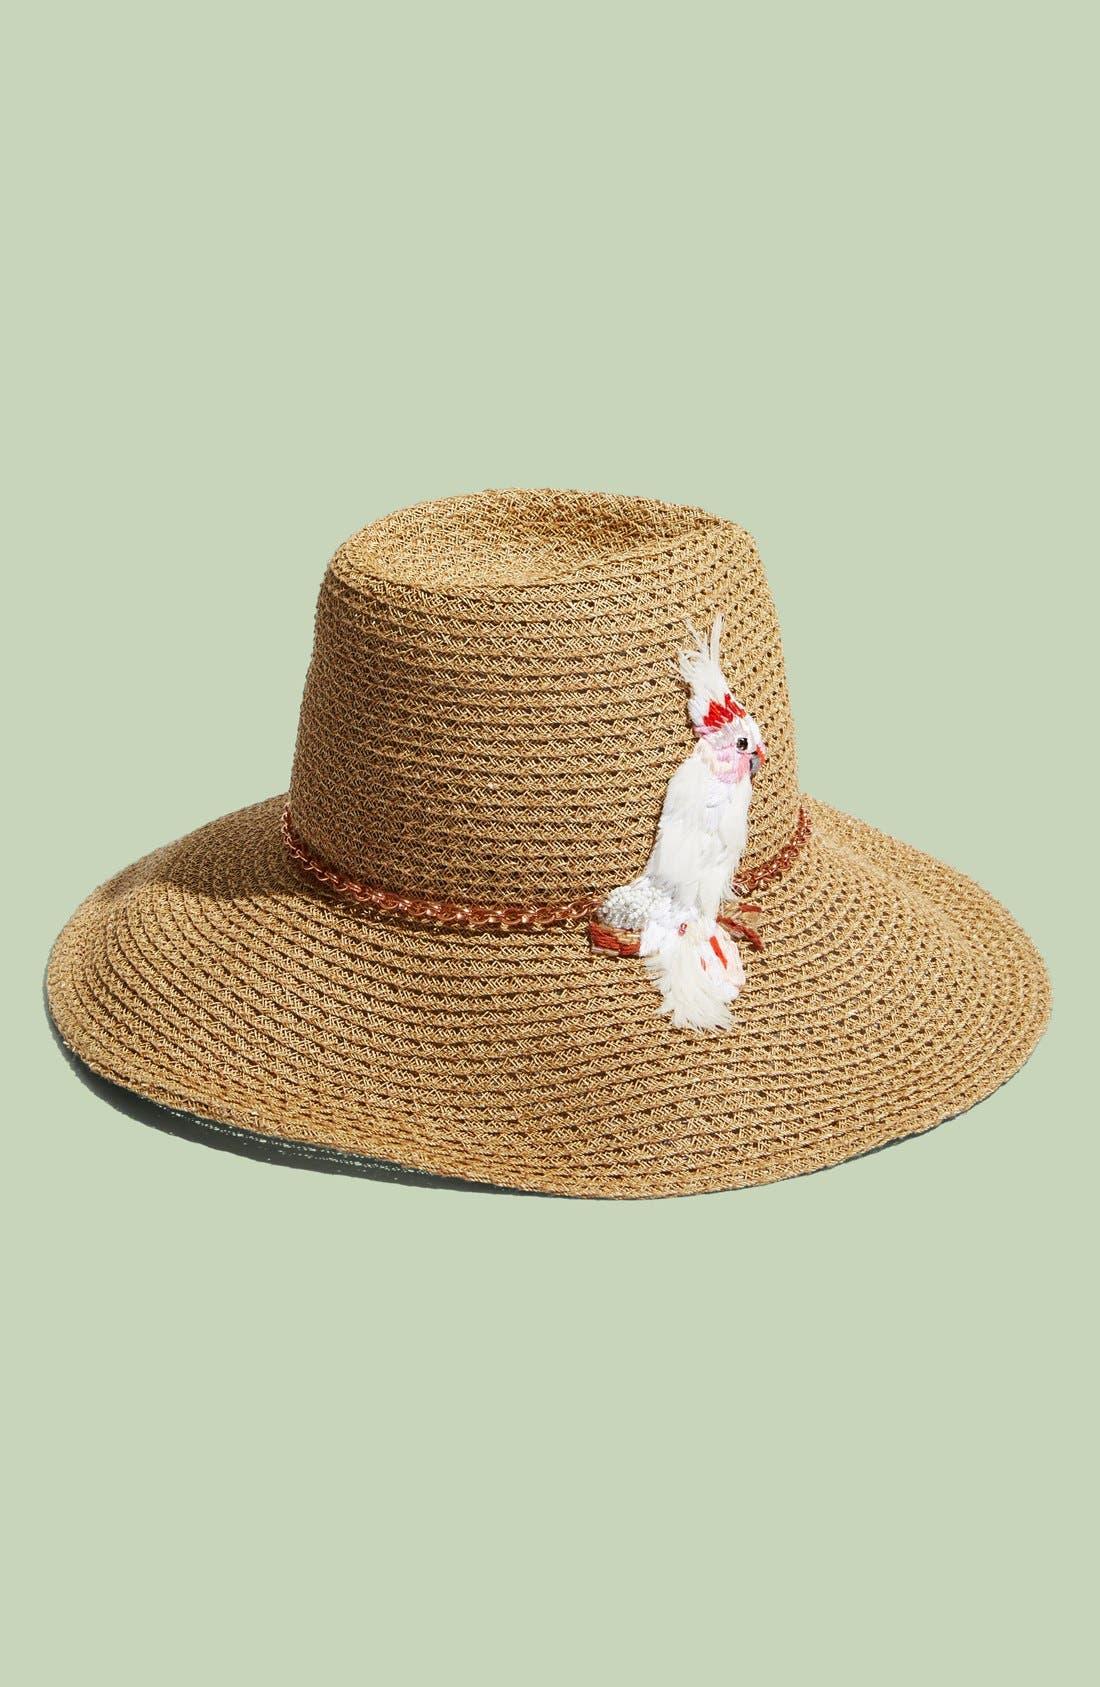 'Emmanuelle' Cockatoo Ornament Straw Hat,                             Main thumbnail 1, color,                             Camel